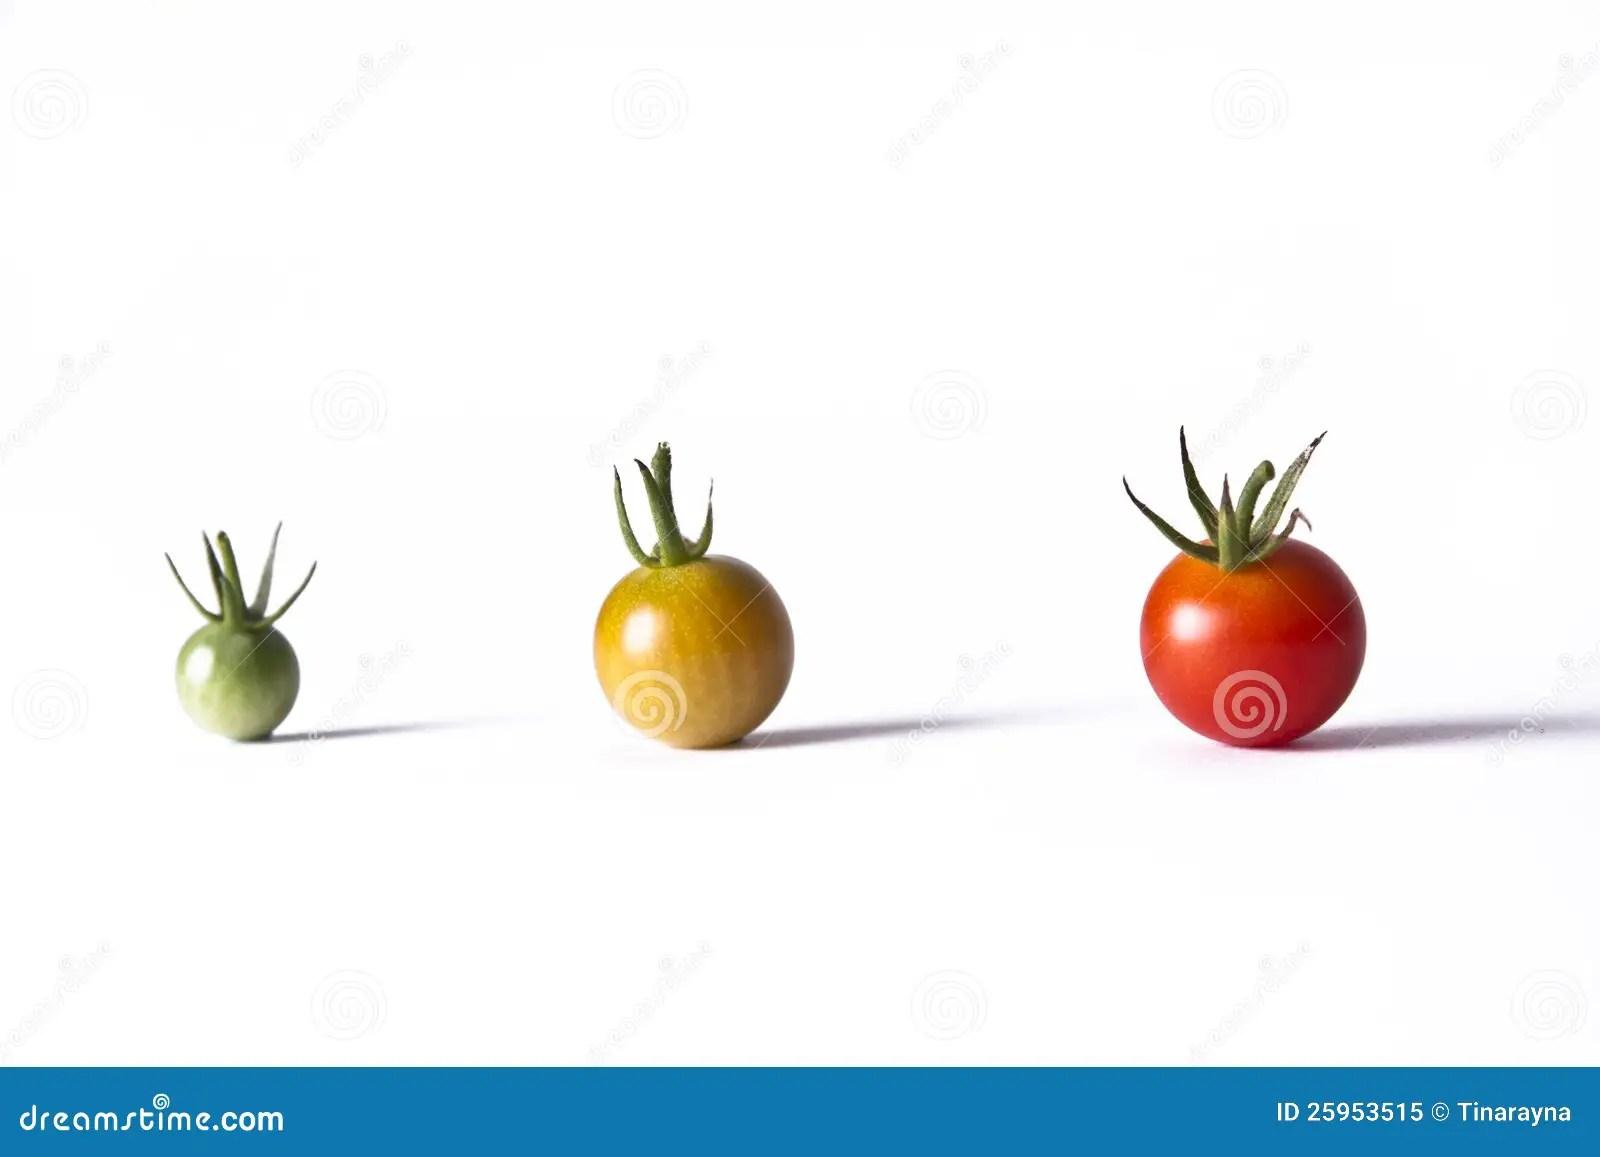 Tomato Life Cycle Royalty Free Stock Photo